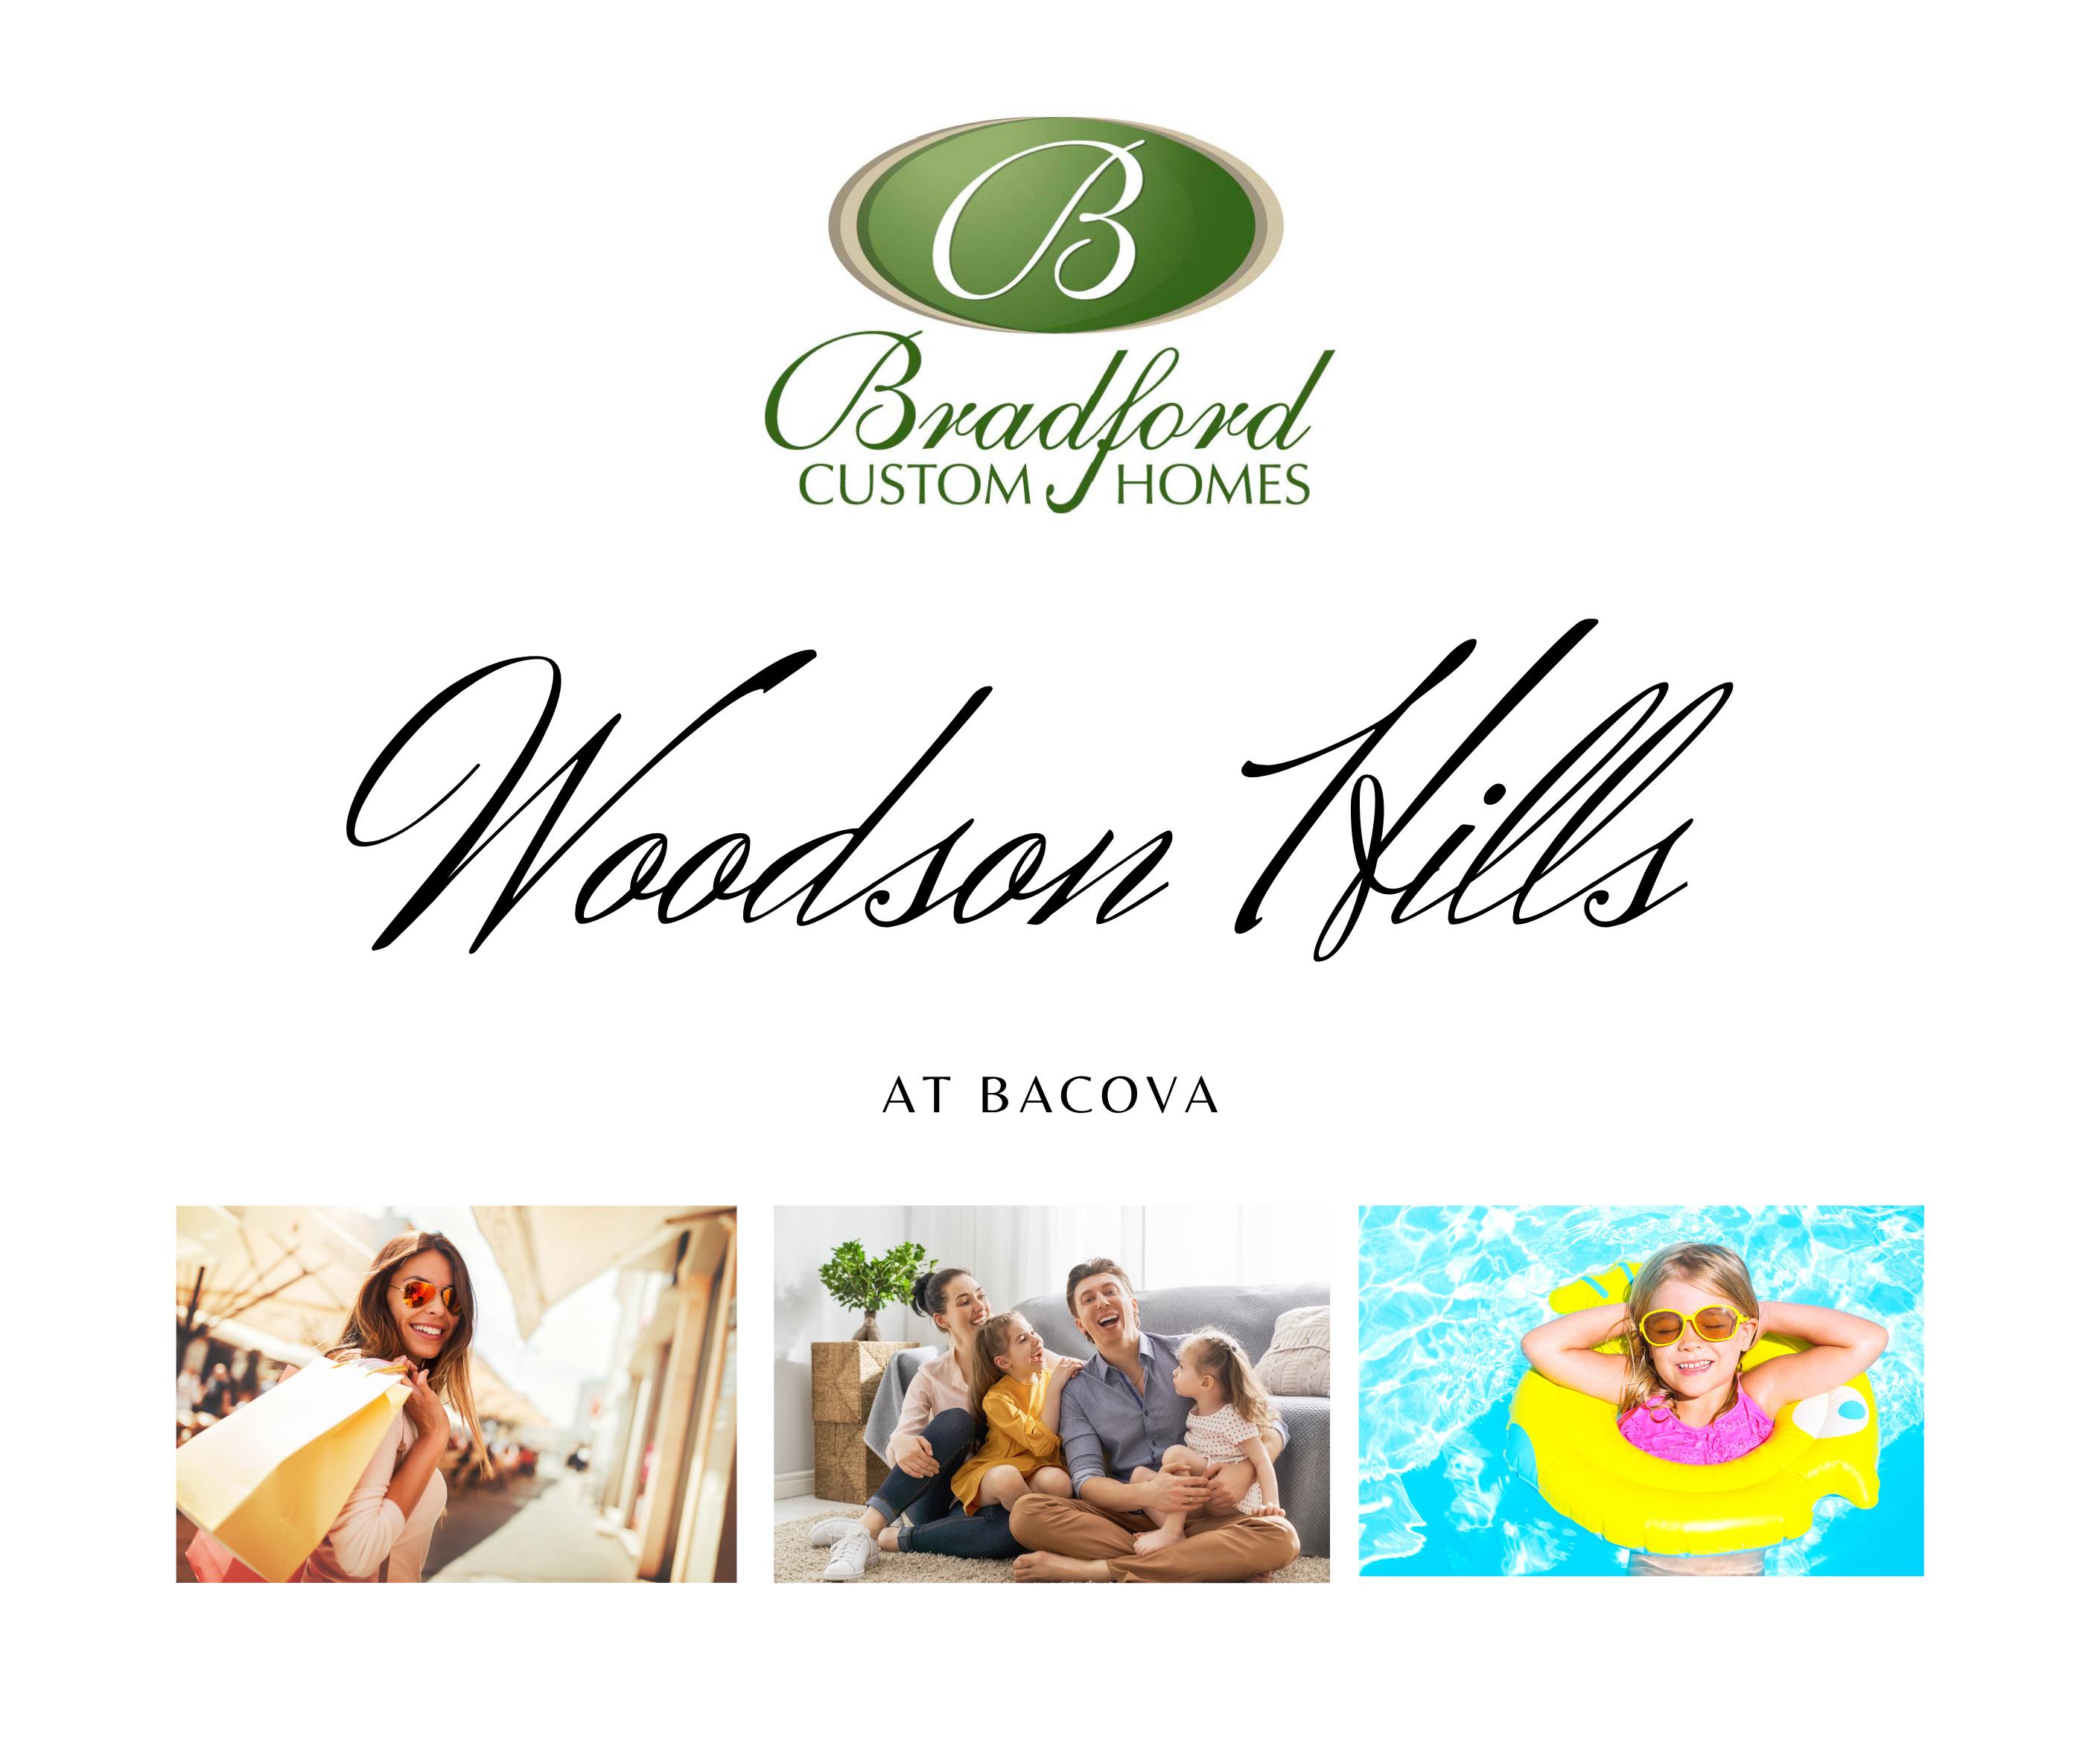 Woodson Hills